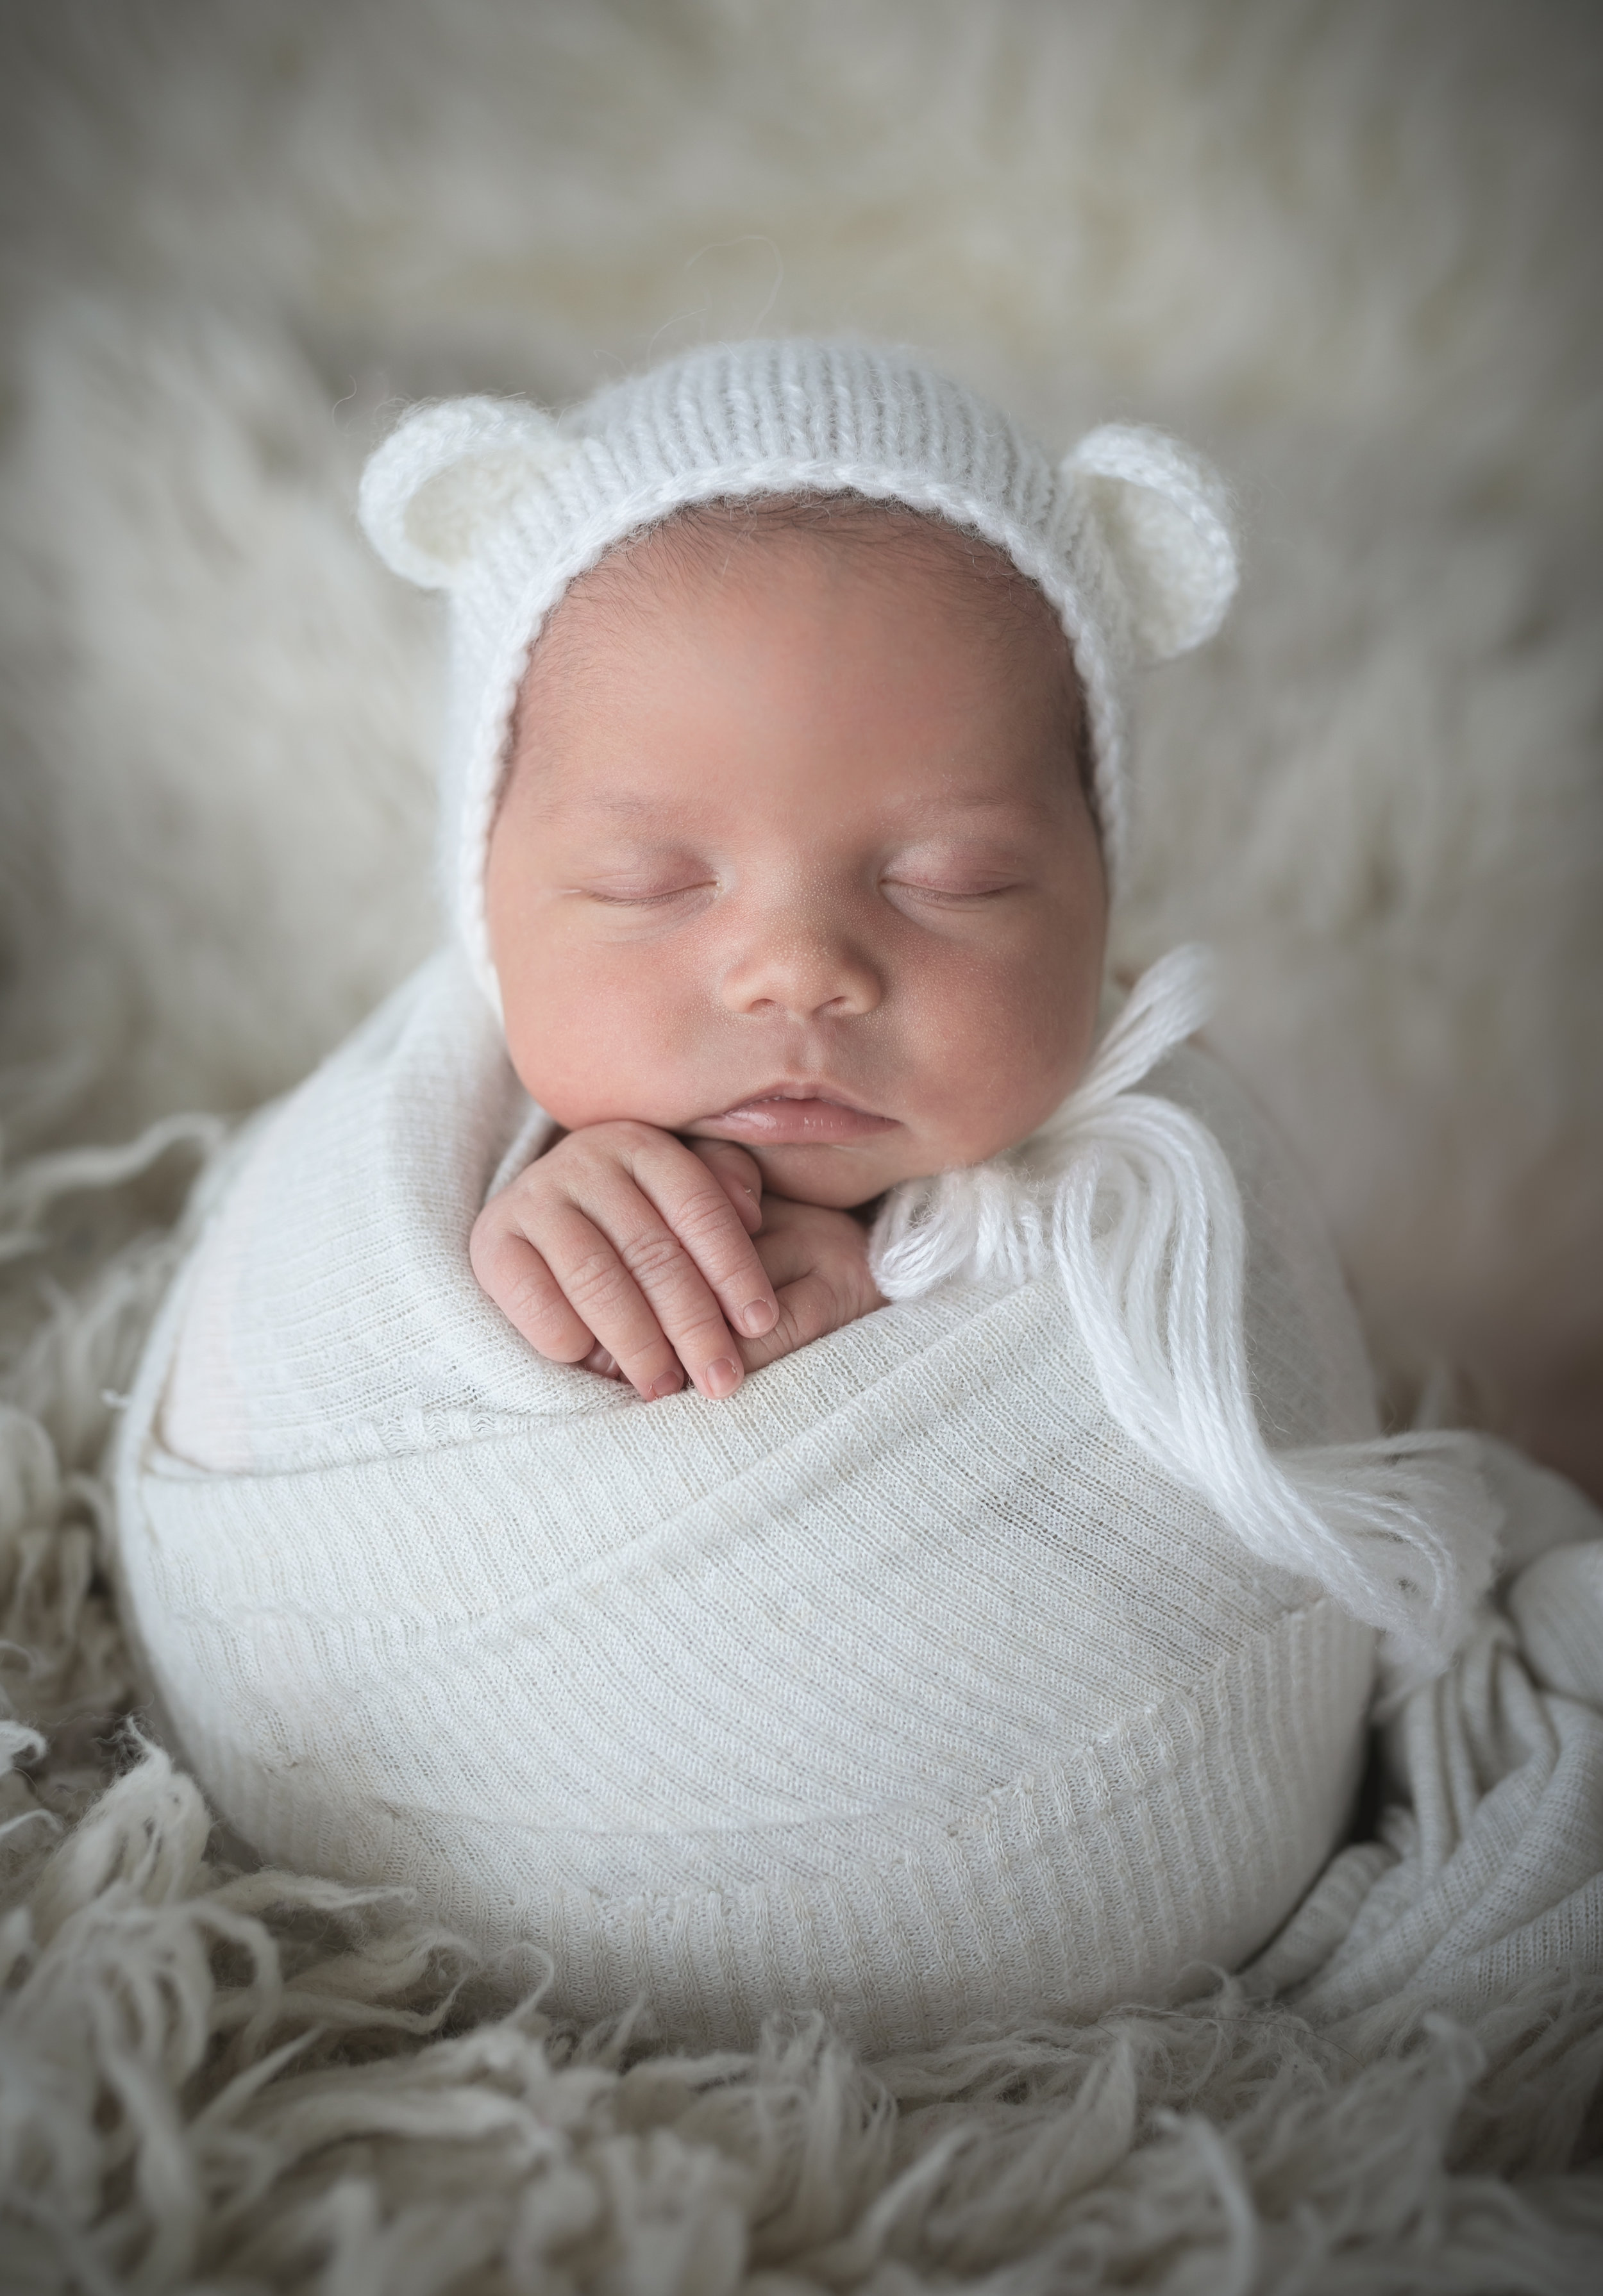 Newborn-Photography-Heather-Elizabeth-photography